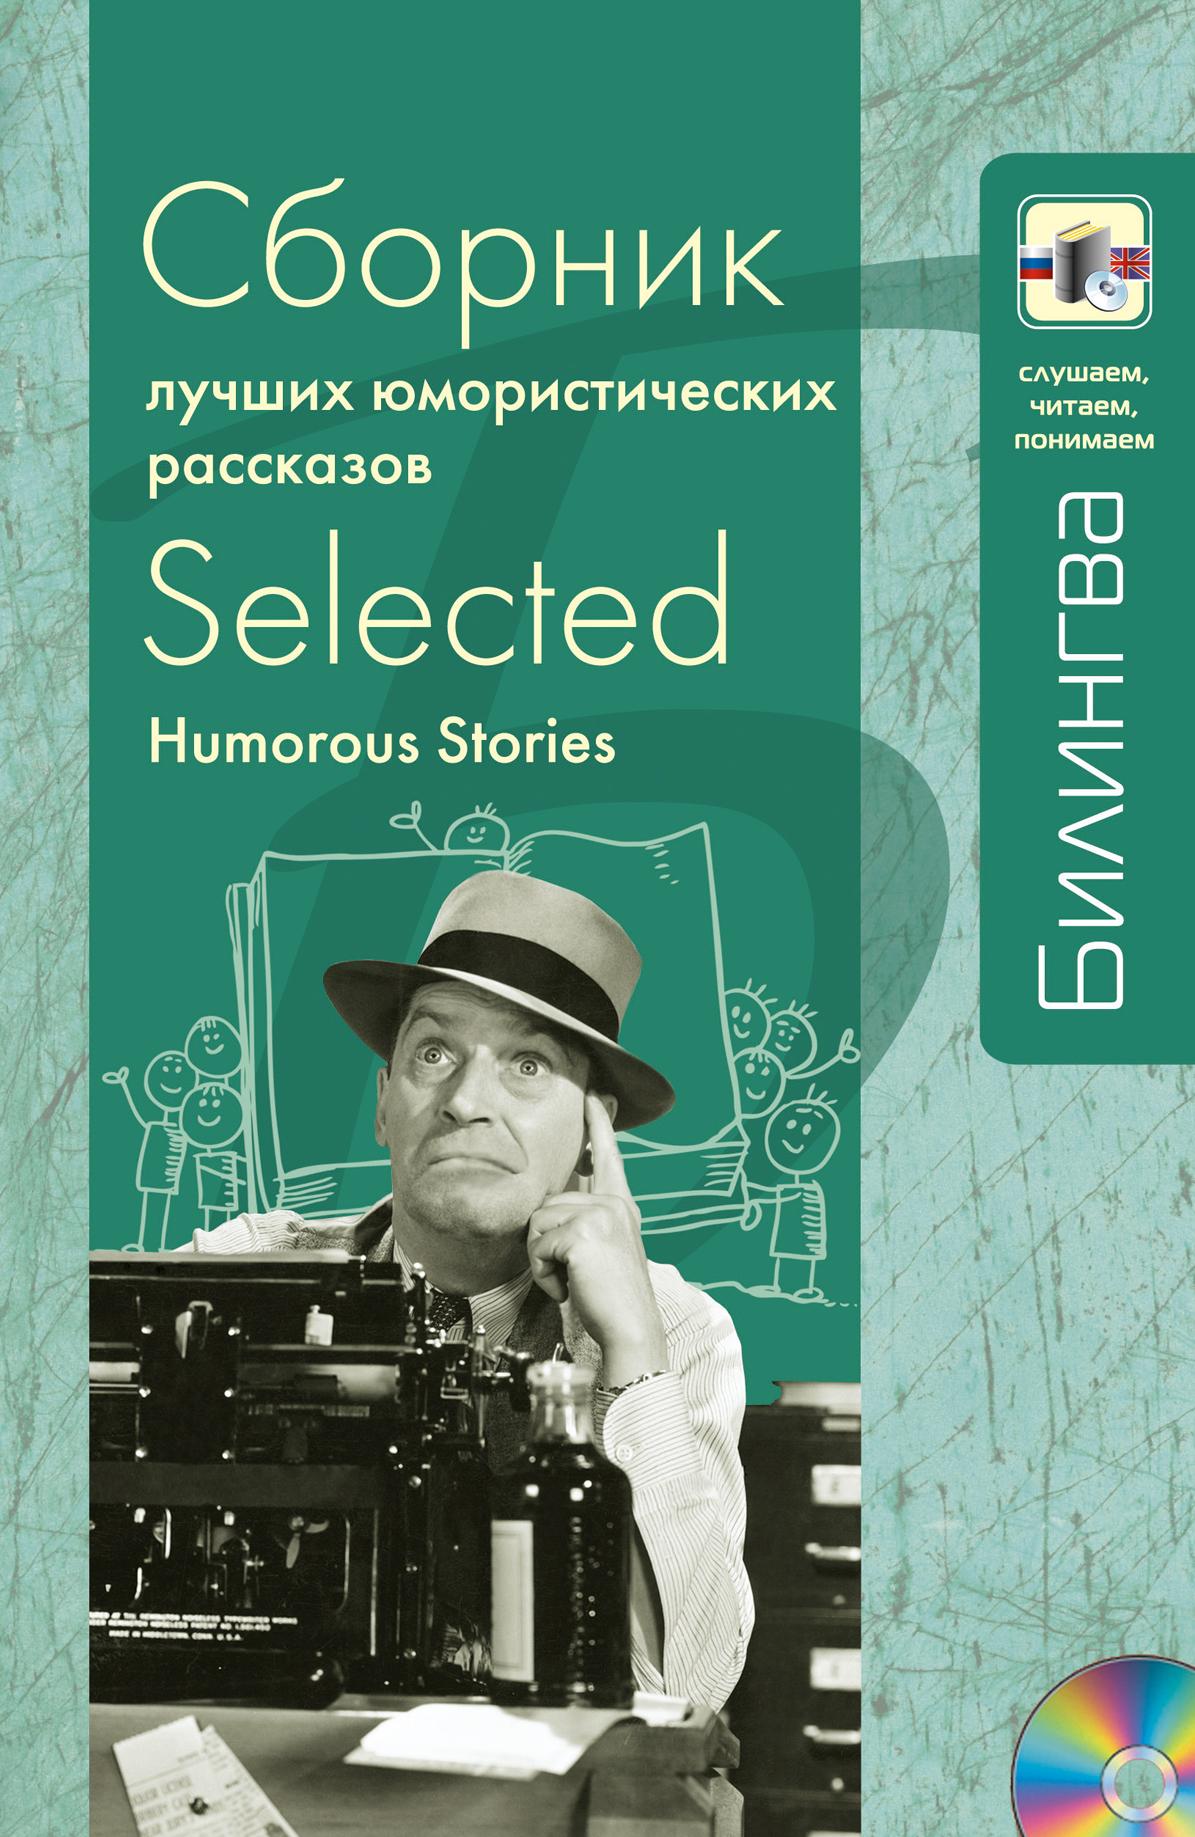 Сборник лучших юмористических рассказов / Selected Humorous Stories (+ CD)